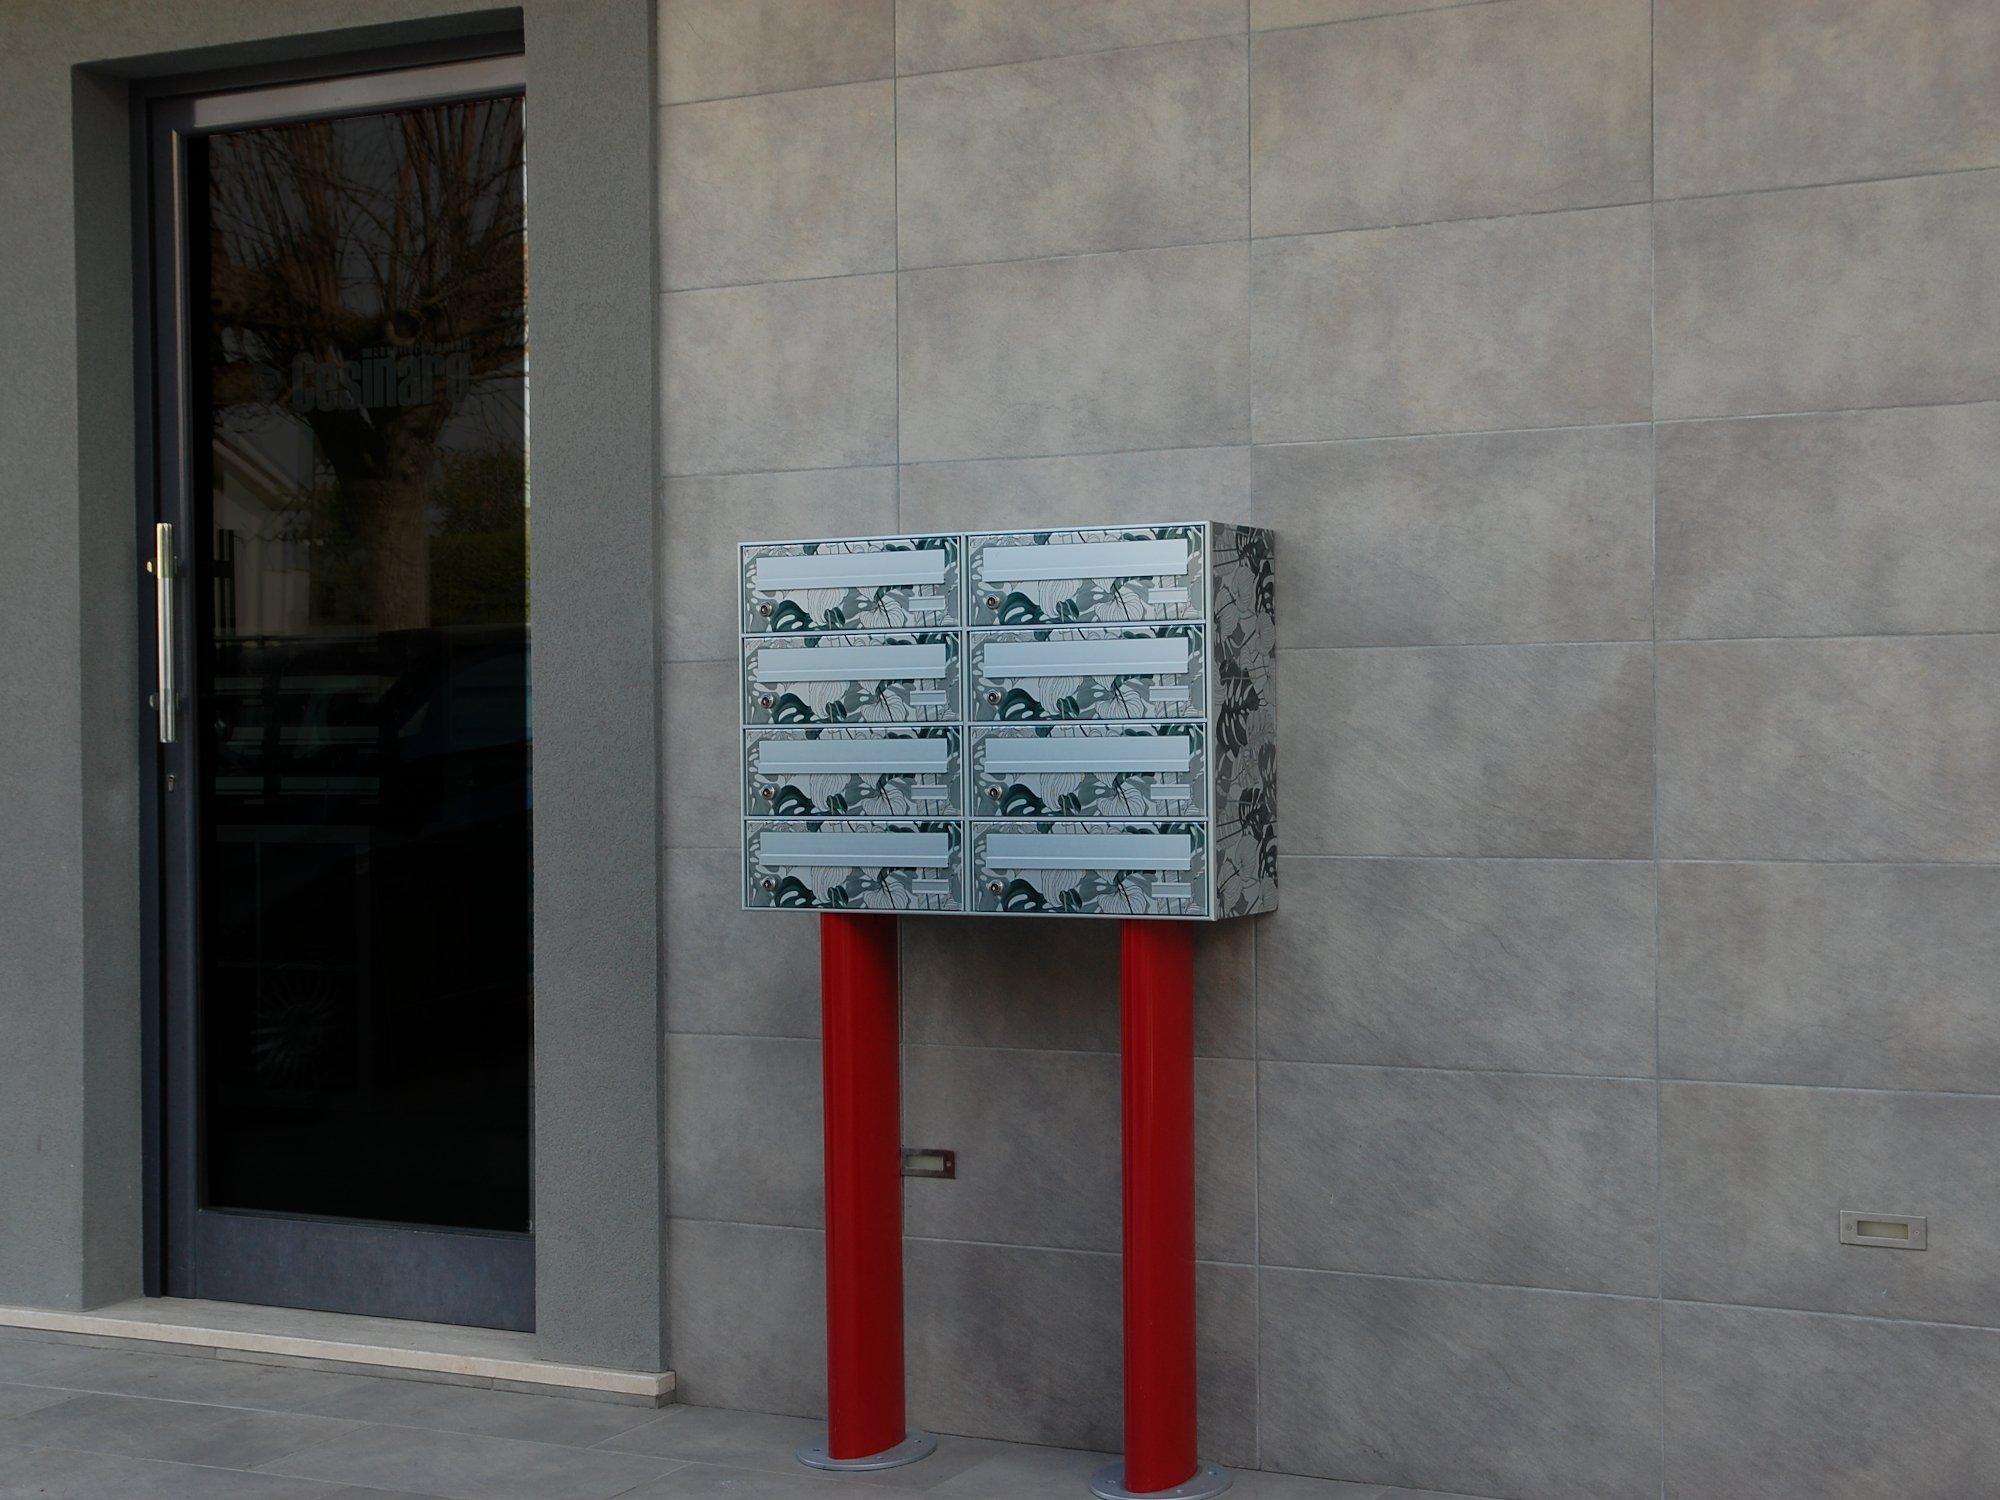 piedistalli cassette postali rossi